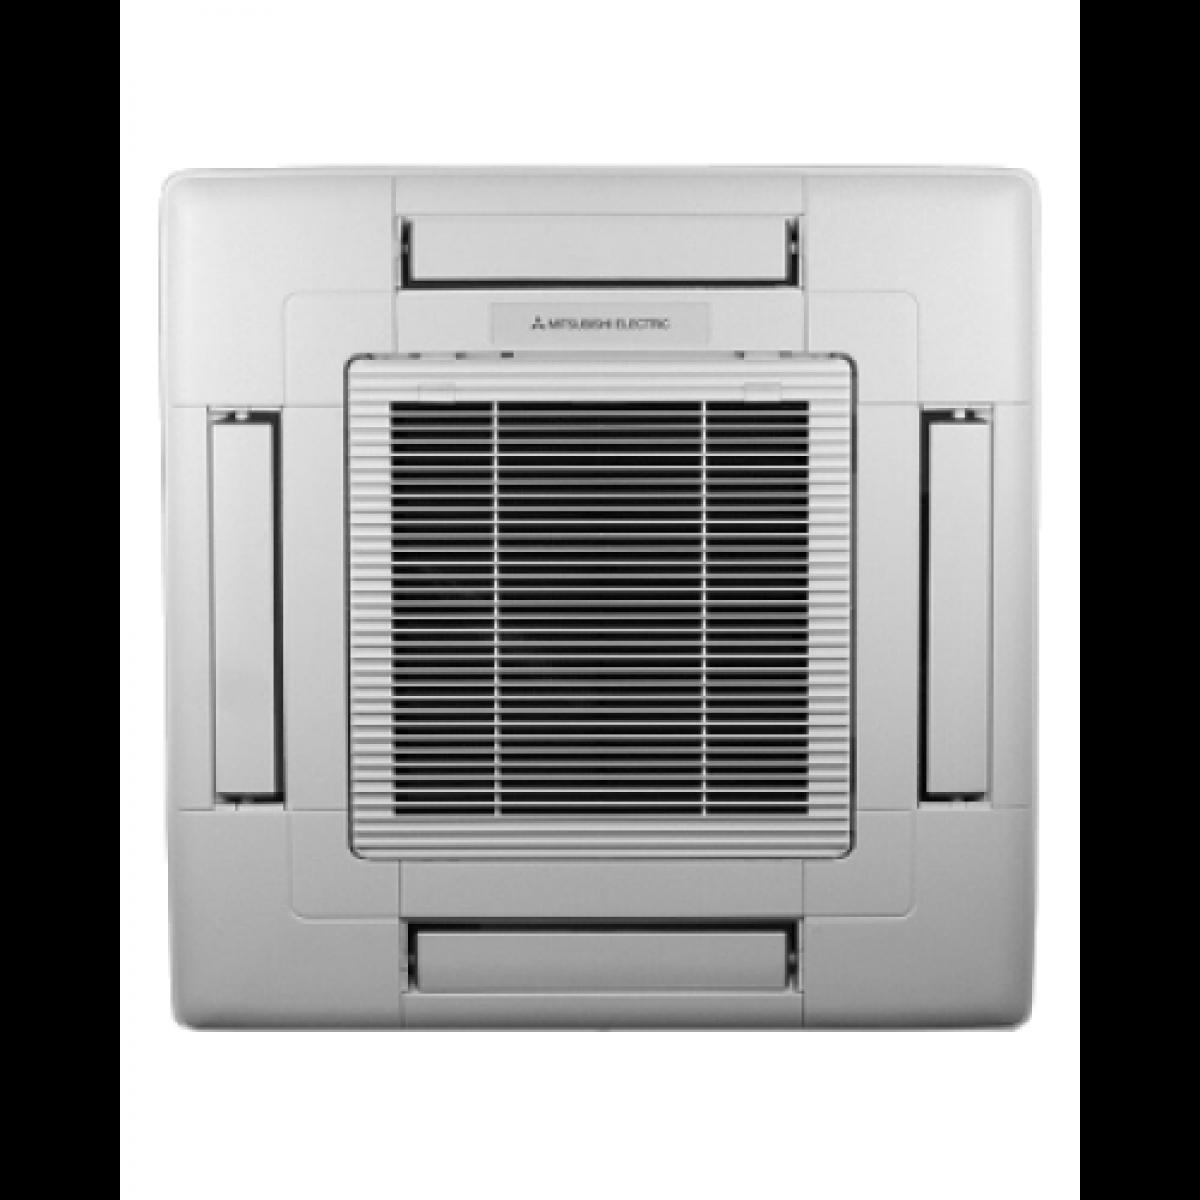 15k Btu Mitsubishi Slzka Ceiling Cassette Heat Pump Indoor